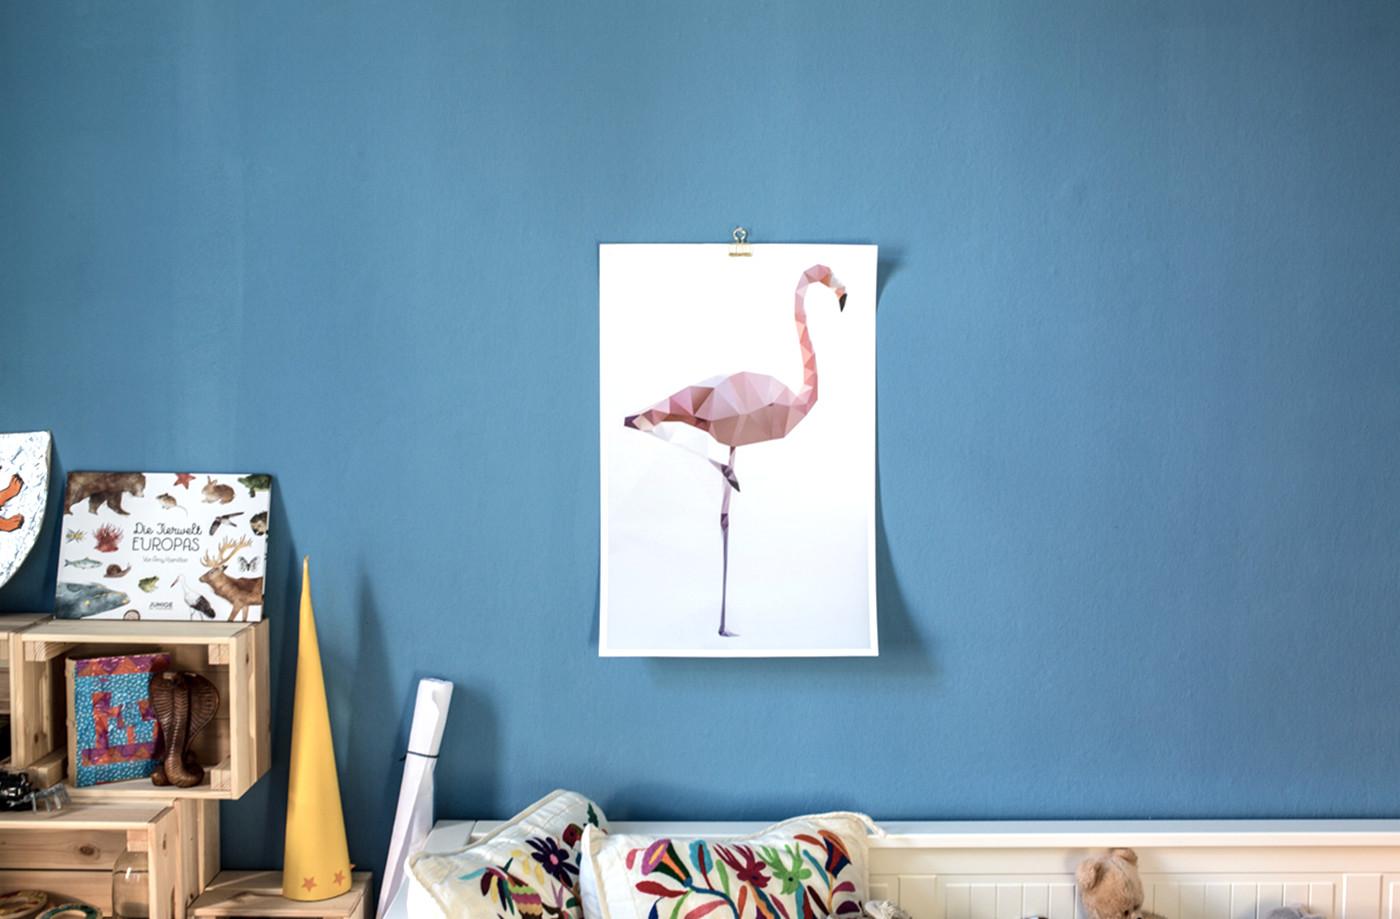 lucie marshall alpina farben. Black Bedroom Furniture Sets. Home Design Ideas